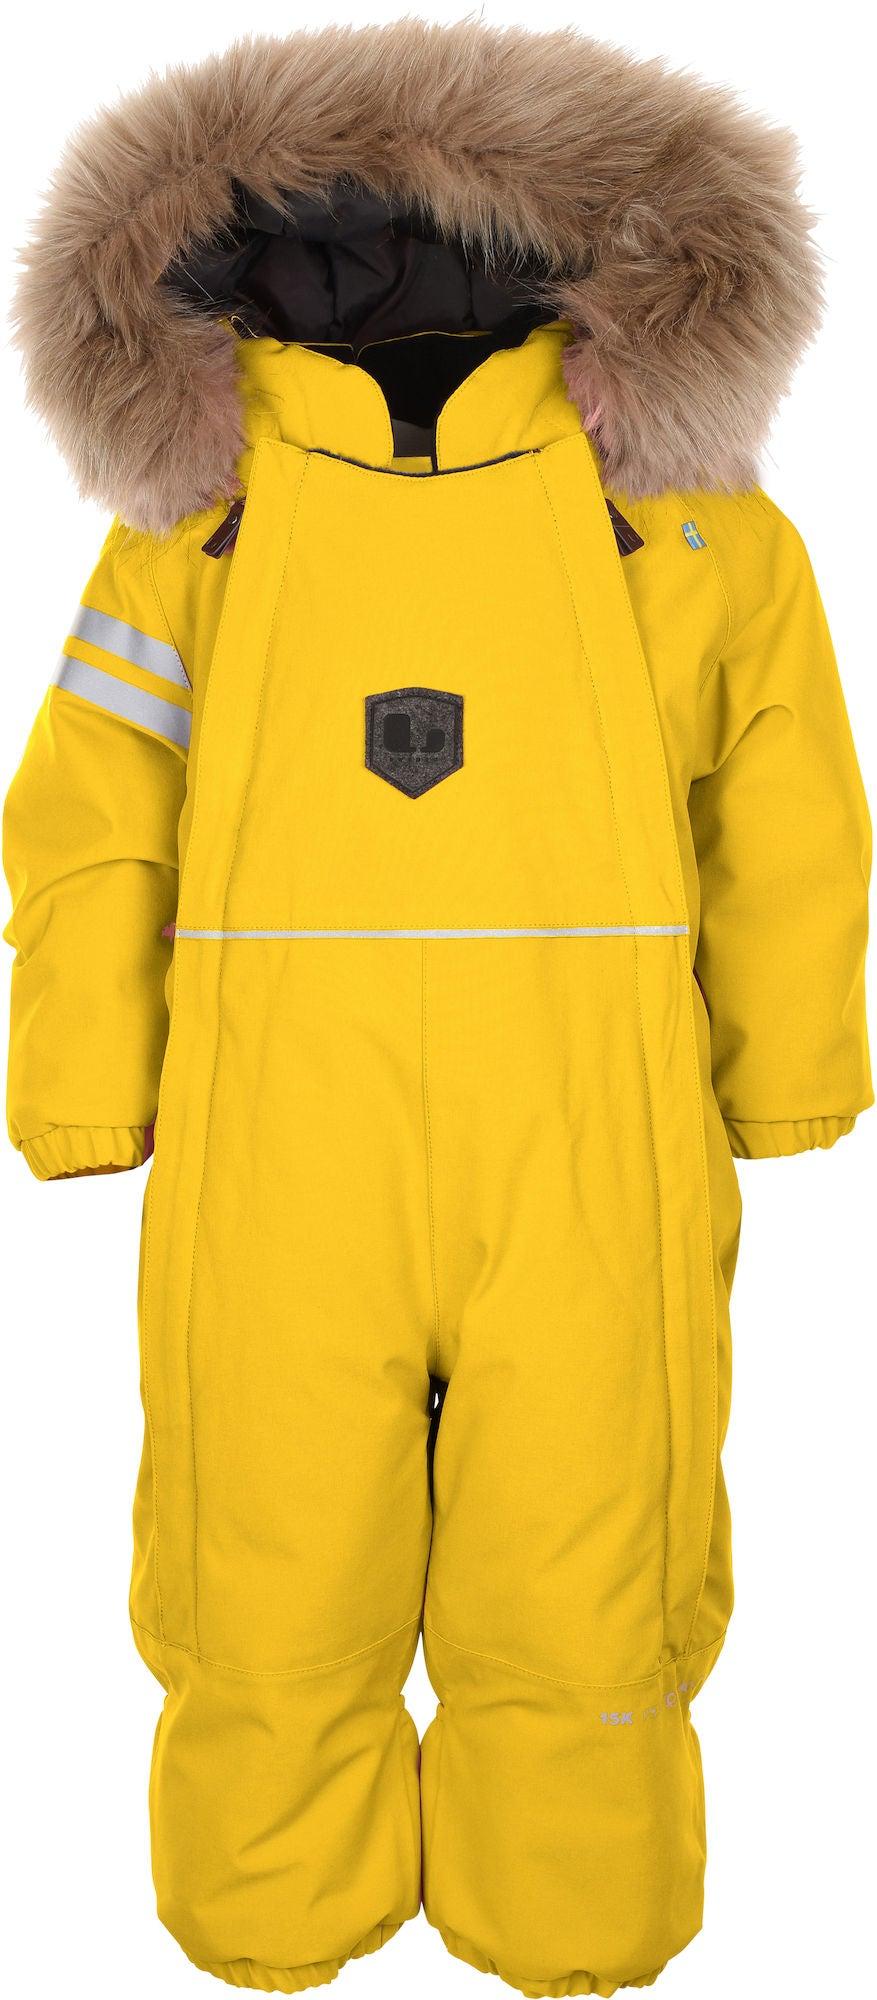 Lindberg Colden Babyoverall, Yellow 62